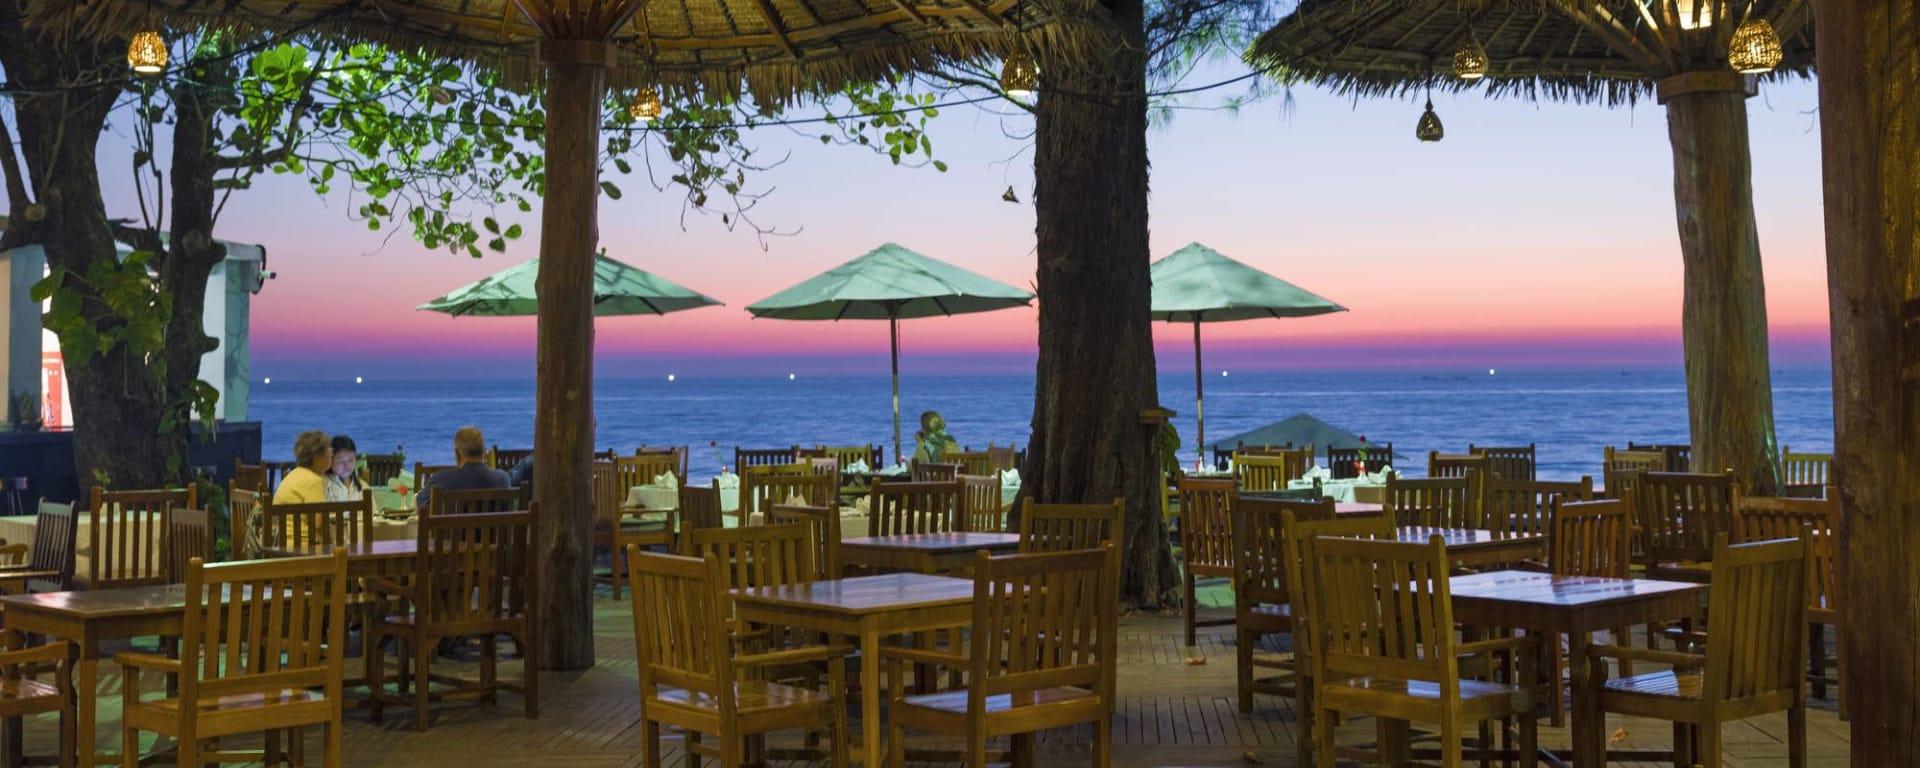 Thande Beach Hotel à Ngapali: Pon Nyet Yeik Restaurant